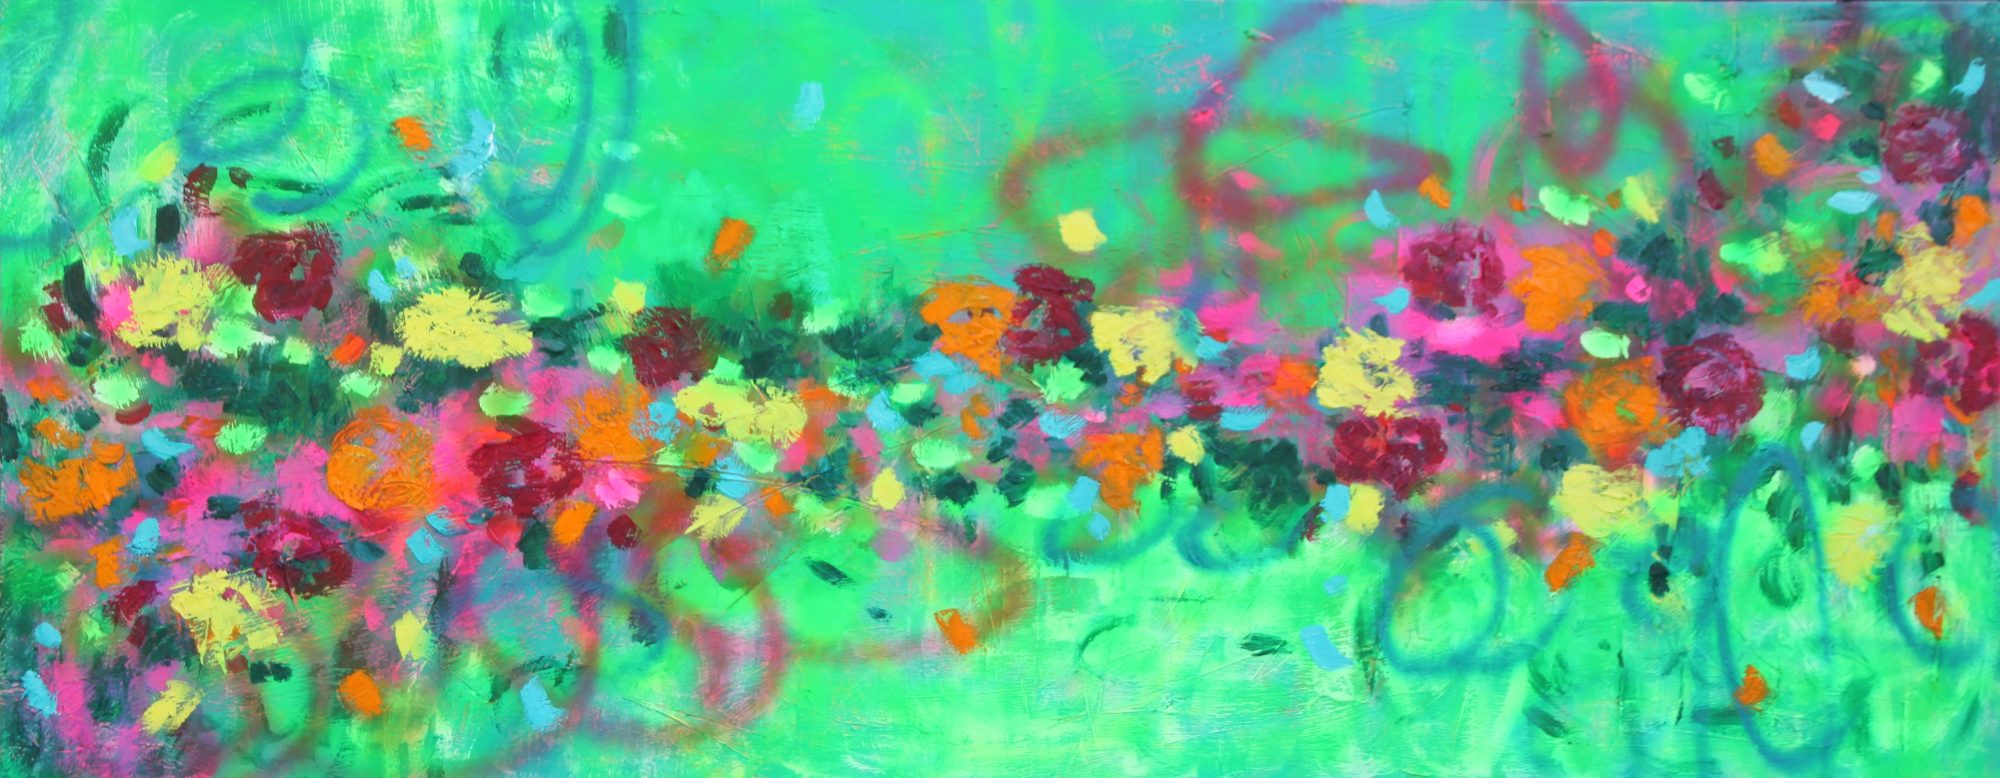 belinda-nadwie-art-sydney-artist-summer flowers 4